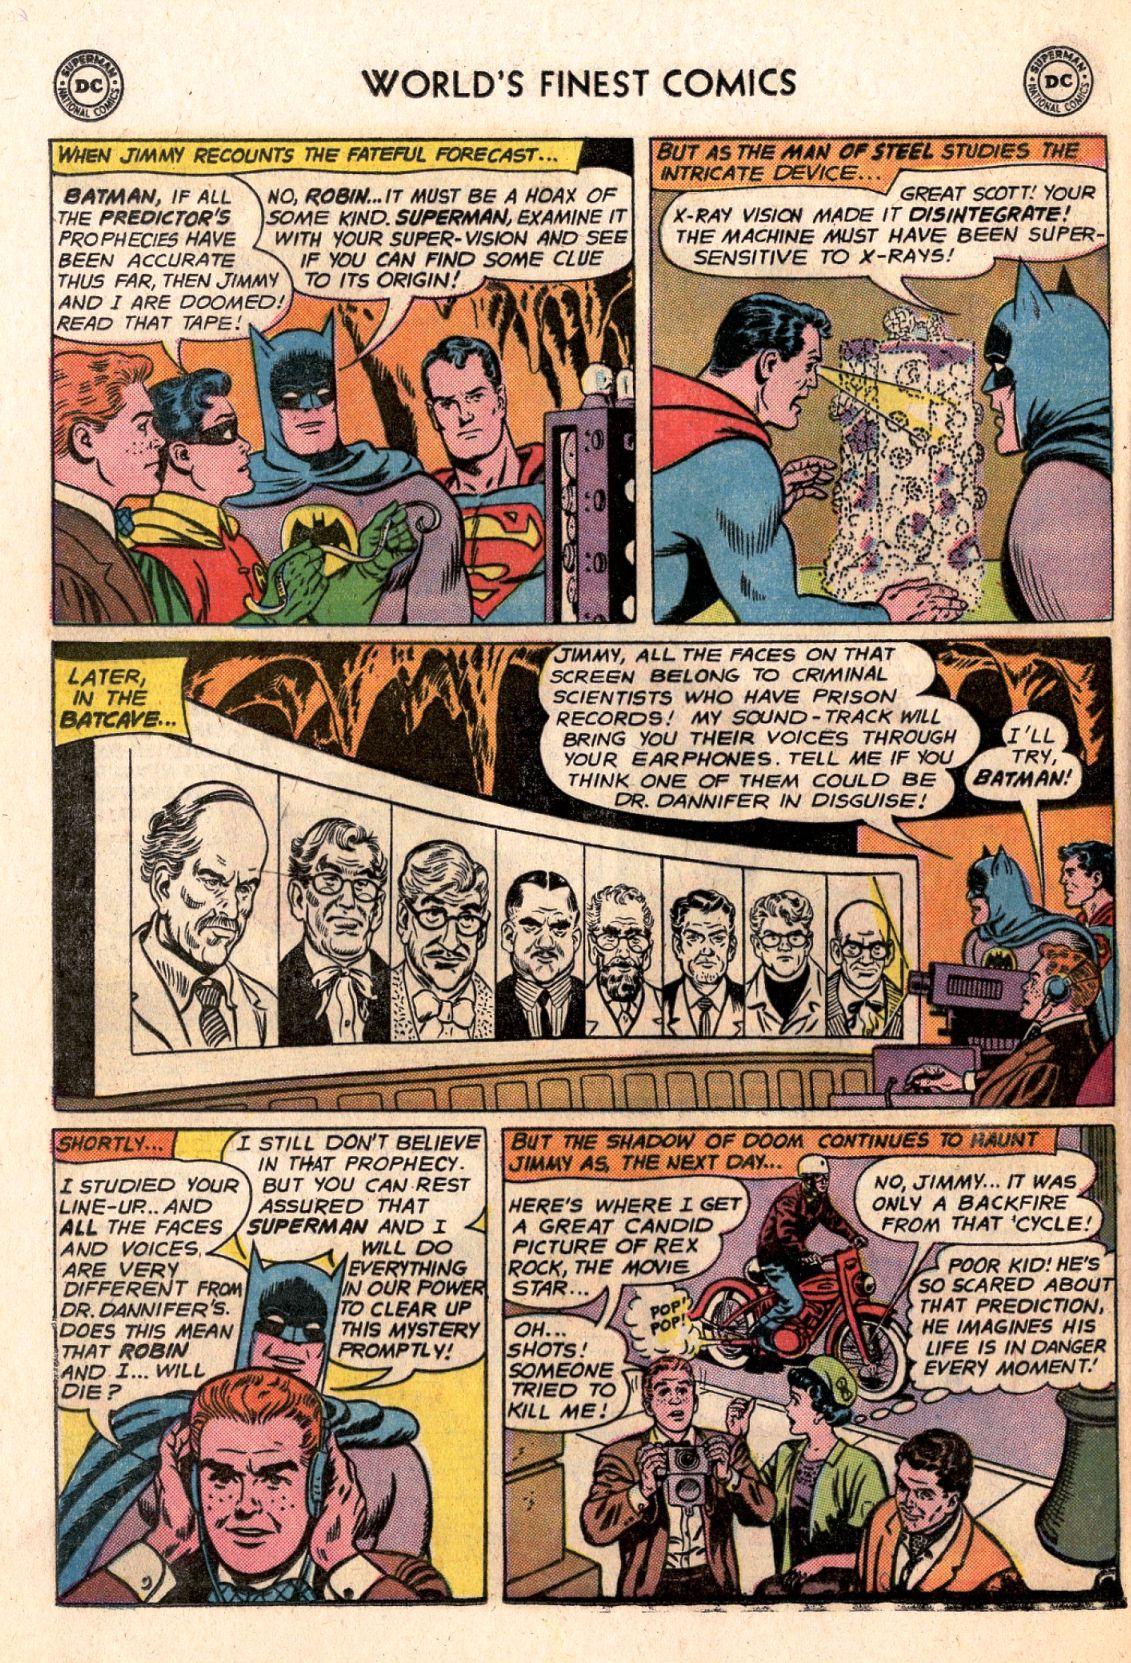 Read online World's Finest Comics comic -  Issue #141 - 8